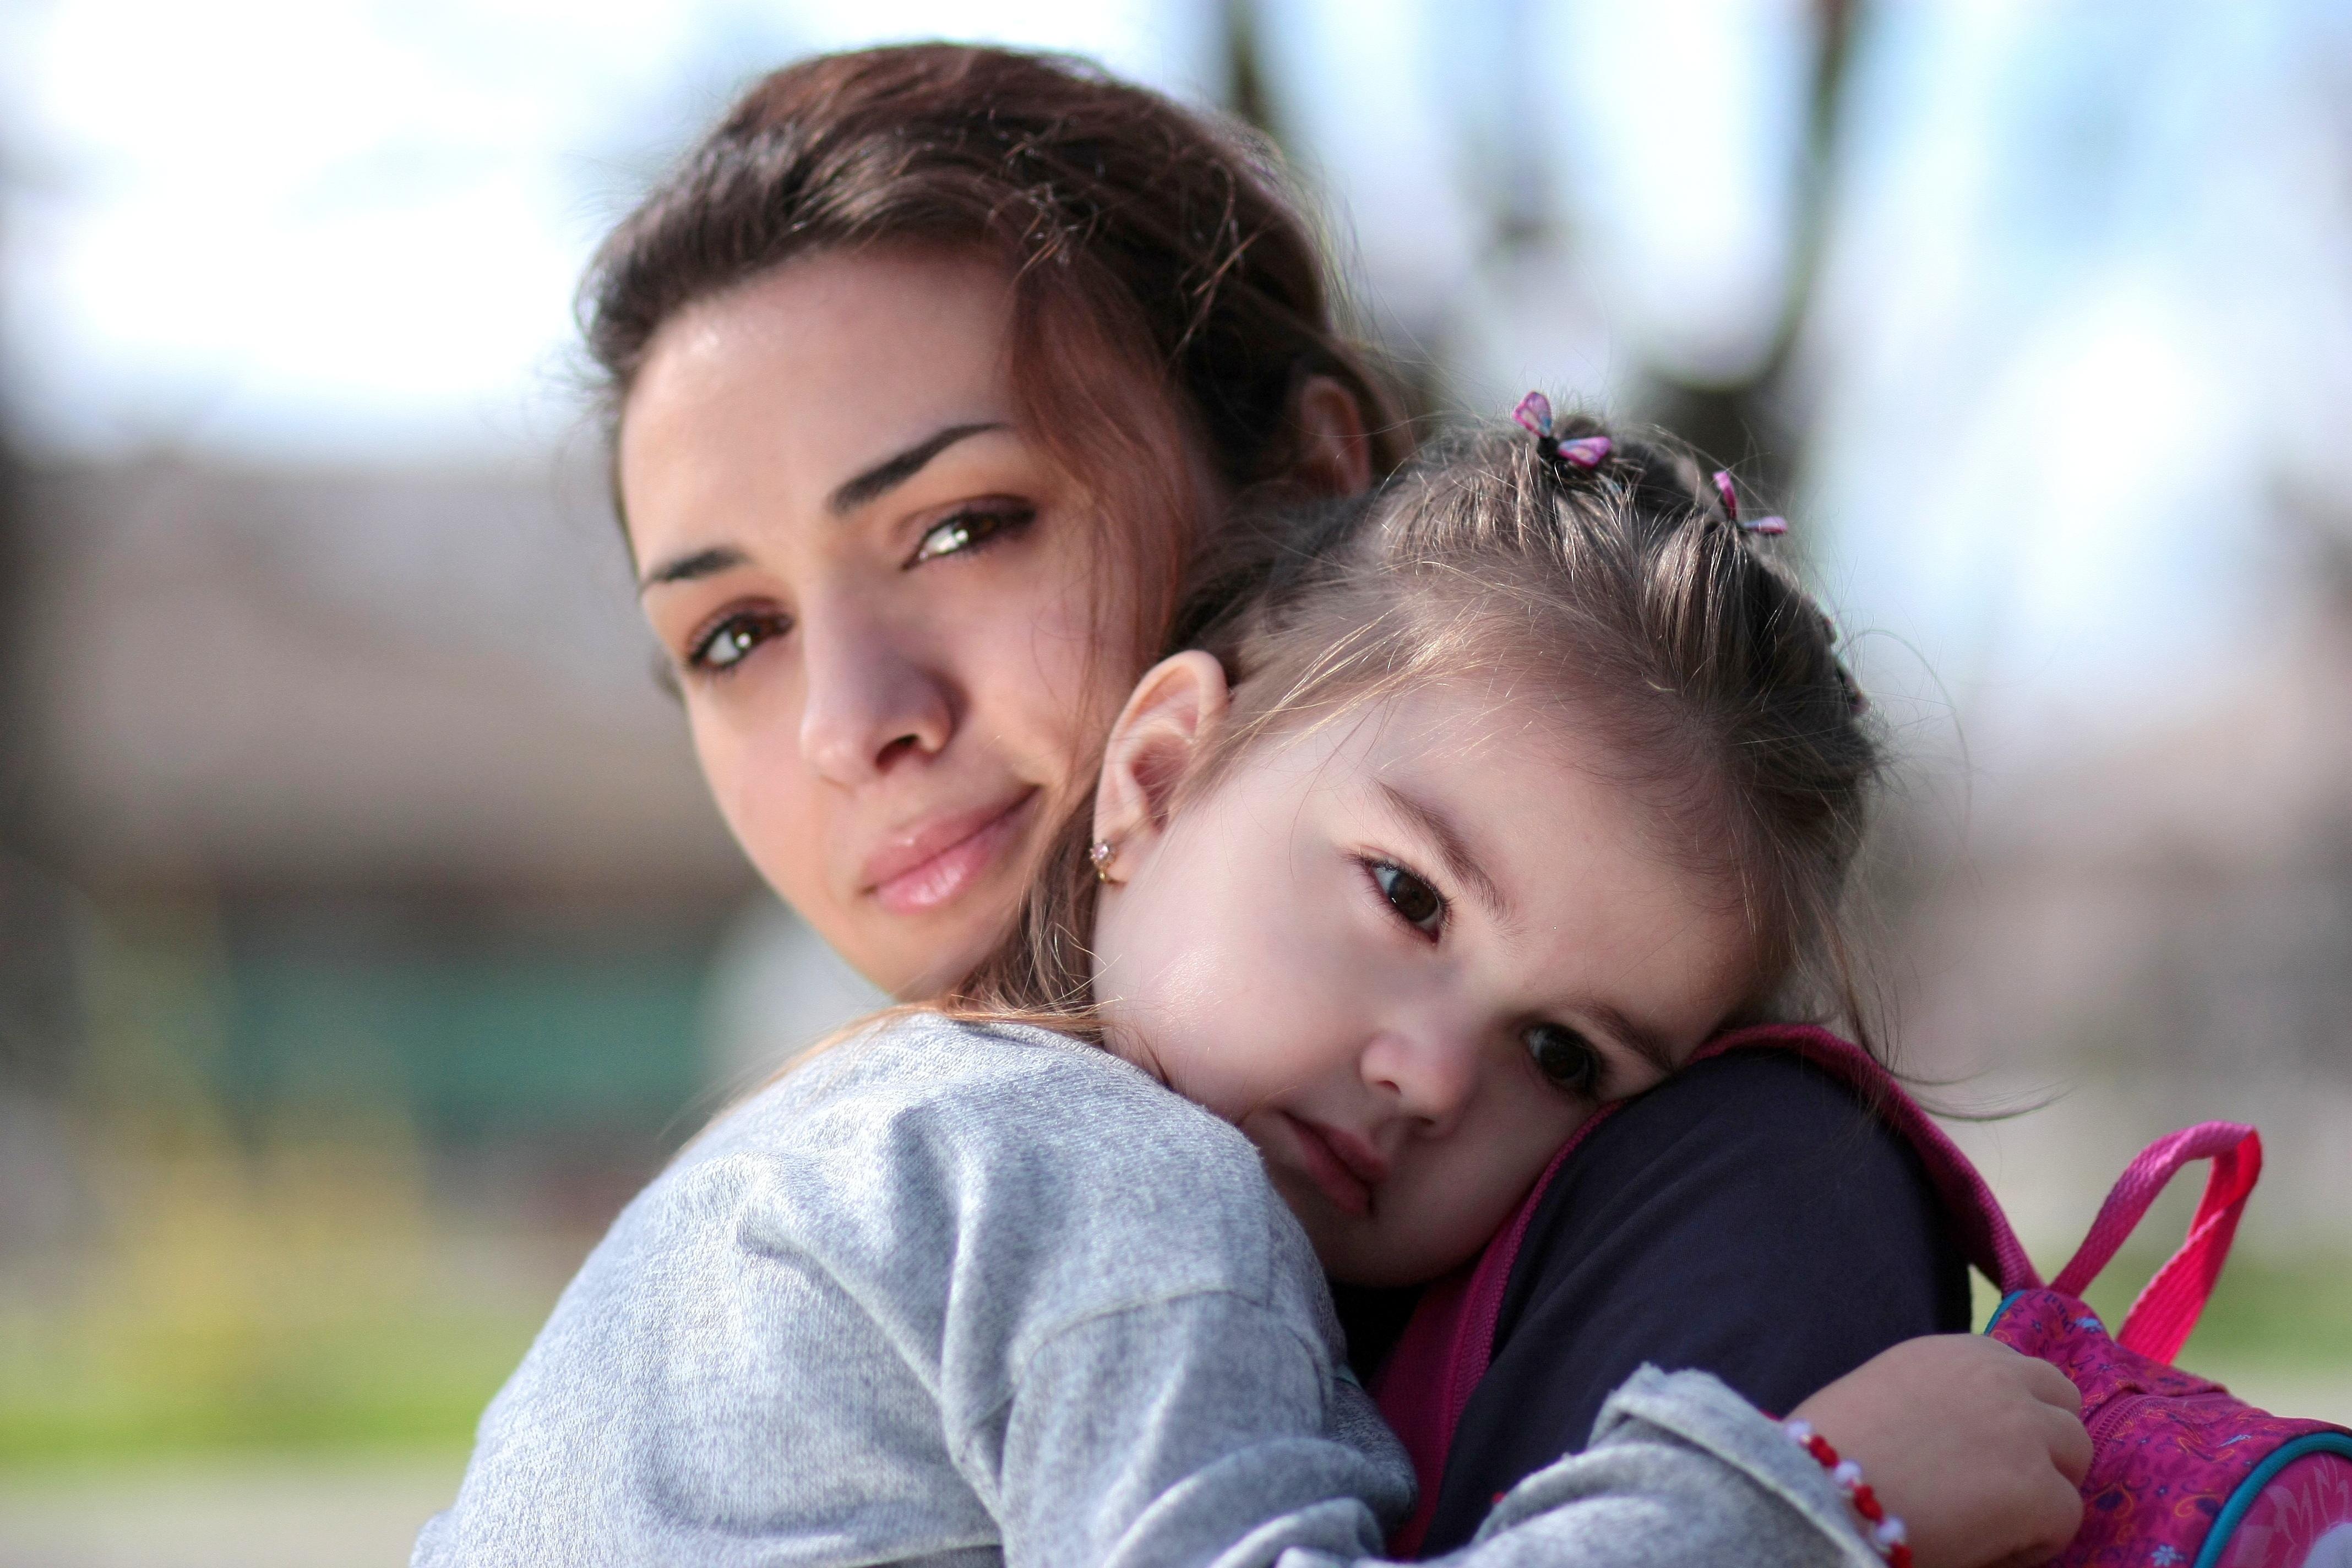 Témoignage: ma fille atteinte du syndrome de Marshall